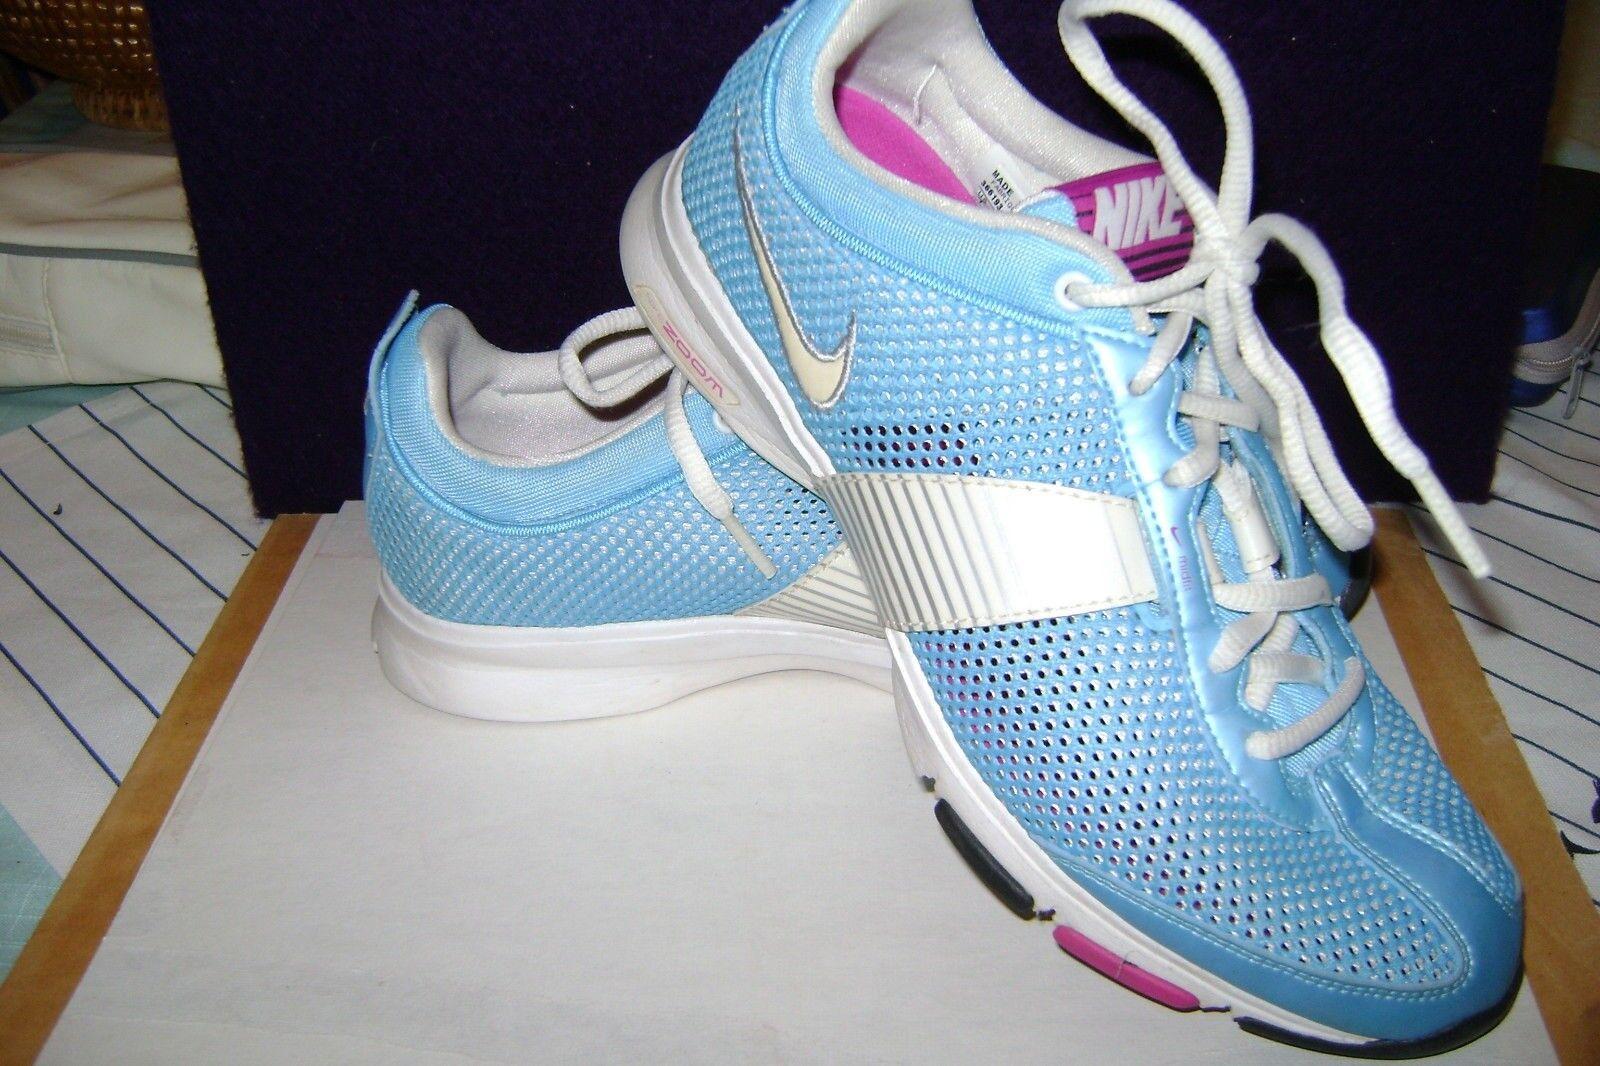 nike zoom 411 trainer essential II 2 running trainers 366193 411 zoom sneakers sz 7 65f533